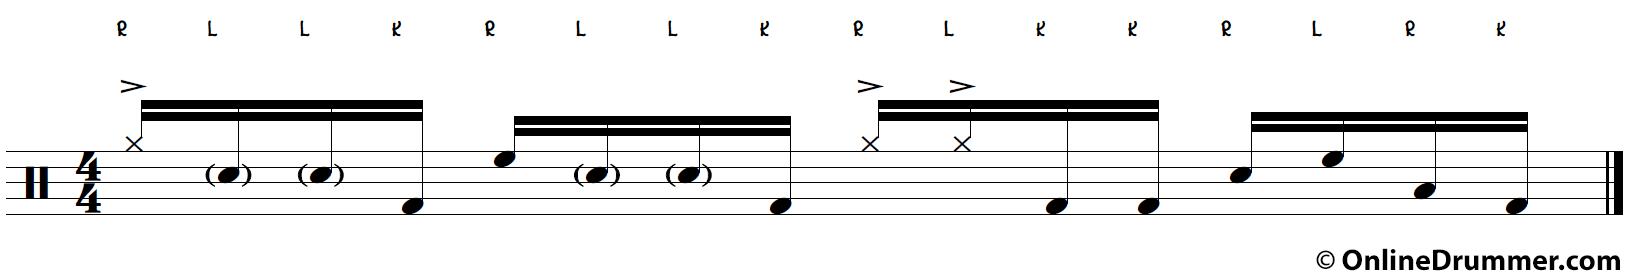 Intermediate to Advanced Drum Lick